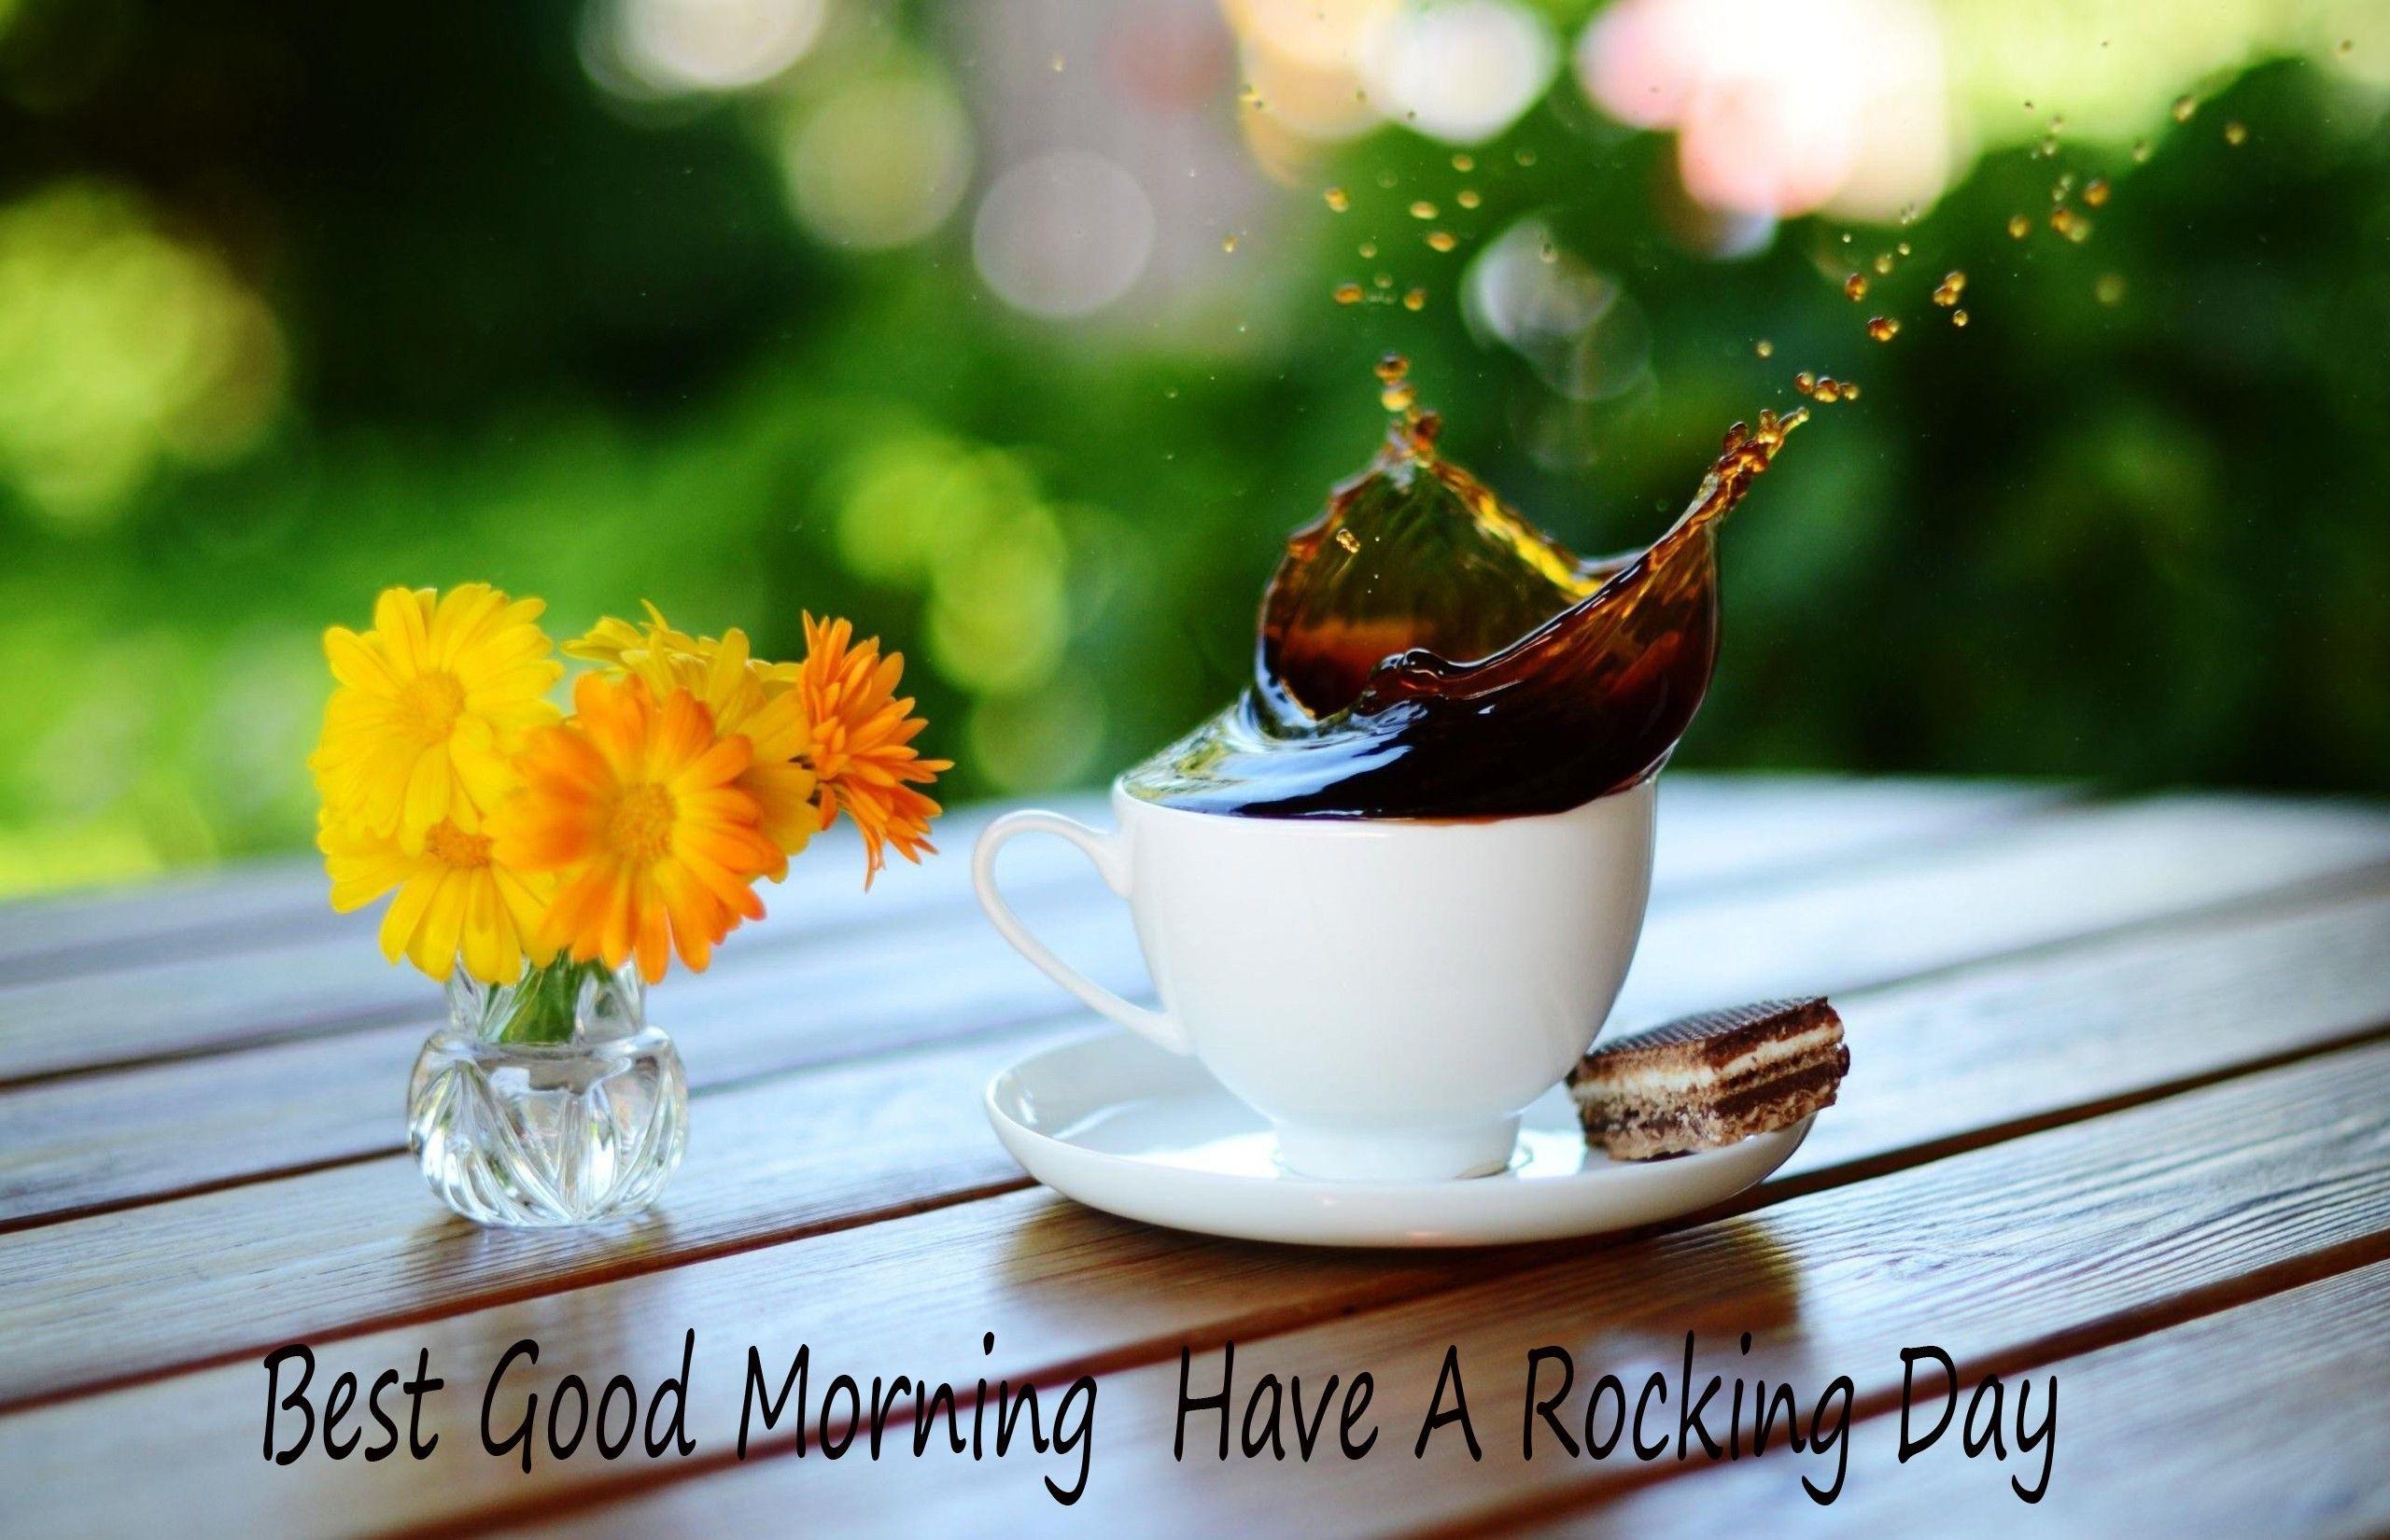 Wallpaper download morning - Good Morning Wallpaper Imgzz Images Blog